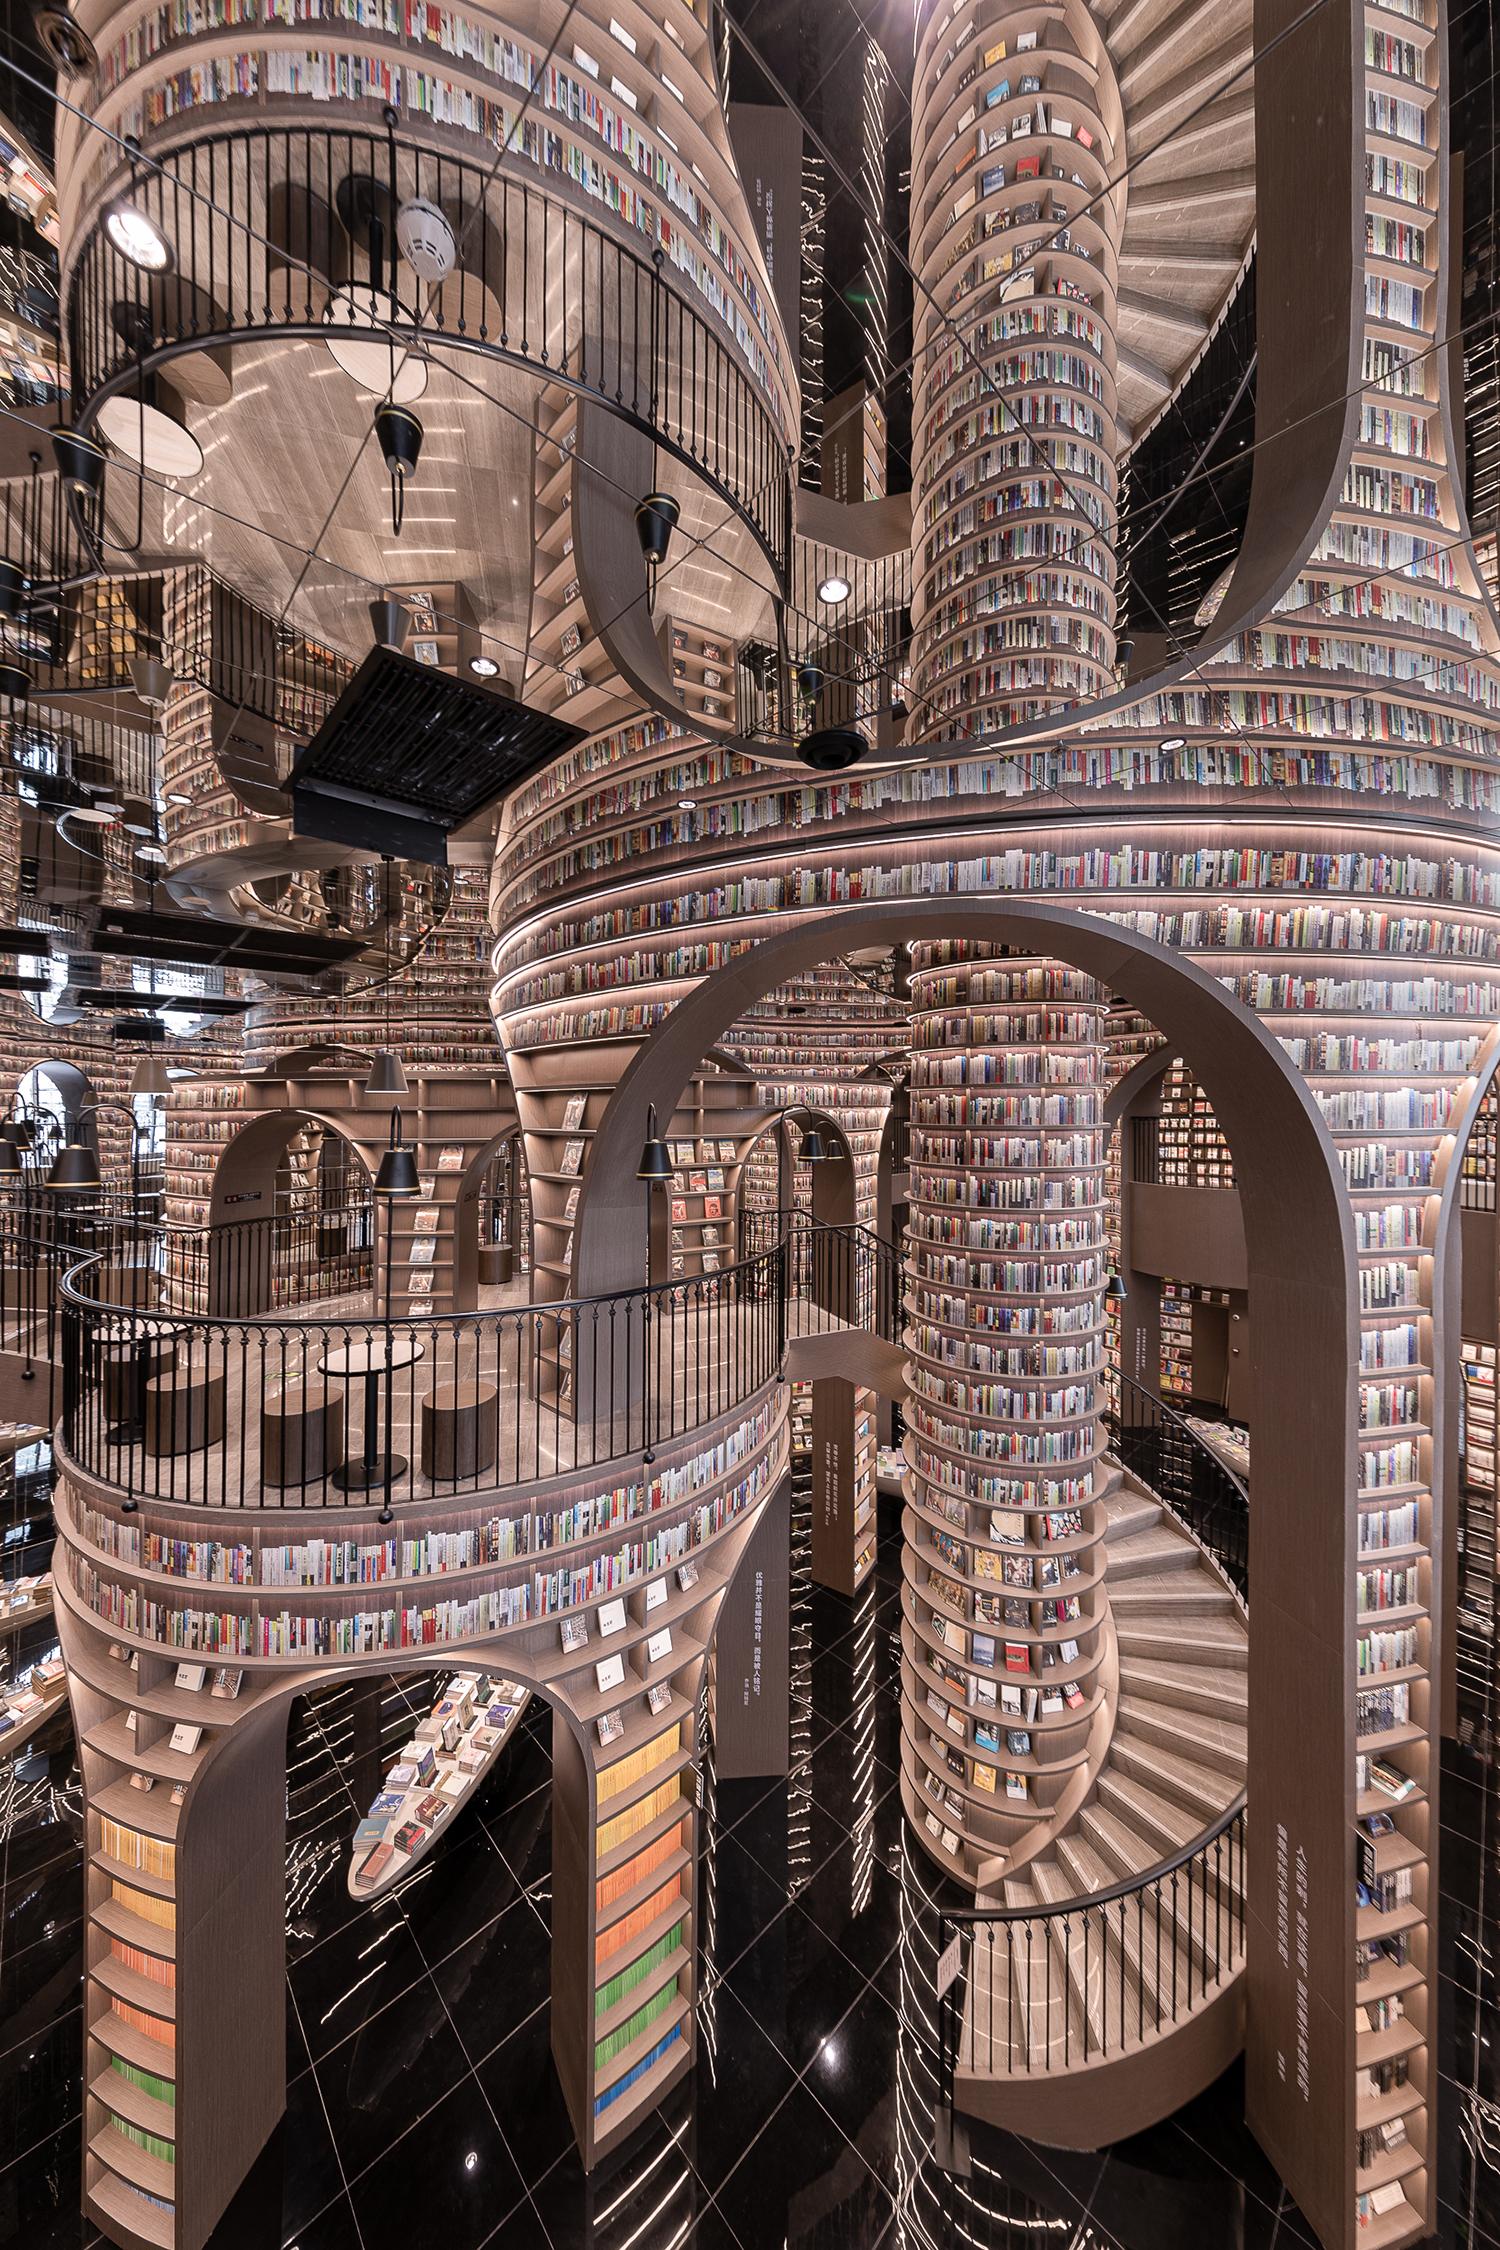 source: https://www.urdesignmag.com/architecture/2020/09/29/dujiangyan-zhongshuge-bookstore-china-xliving/